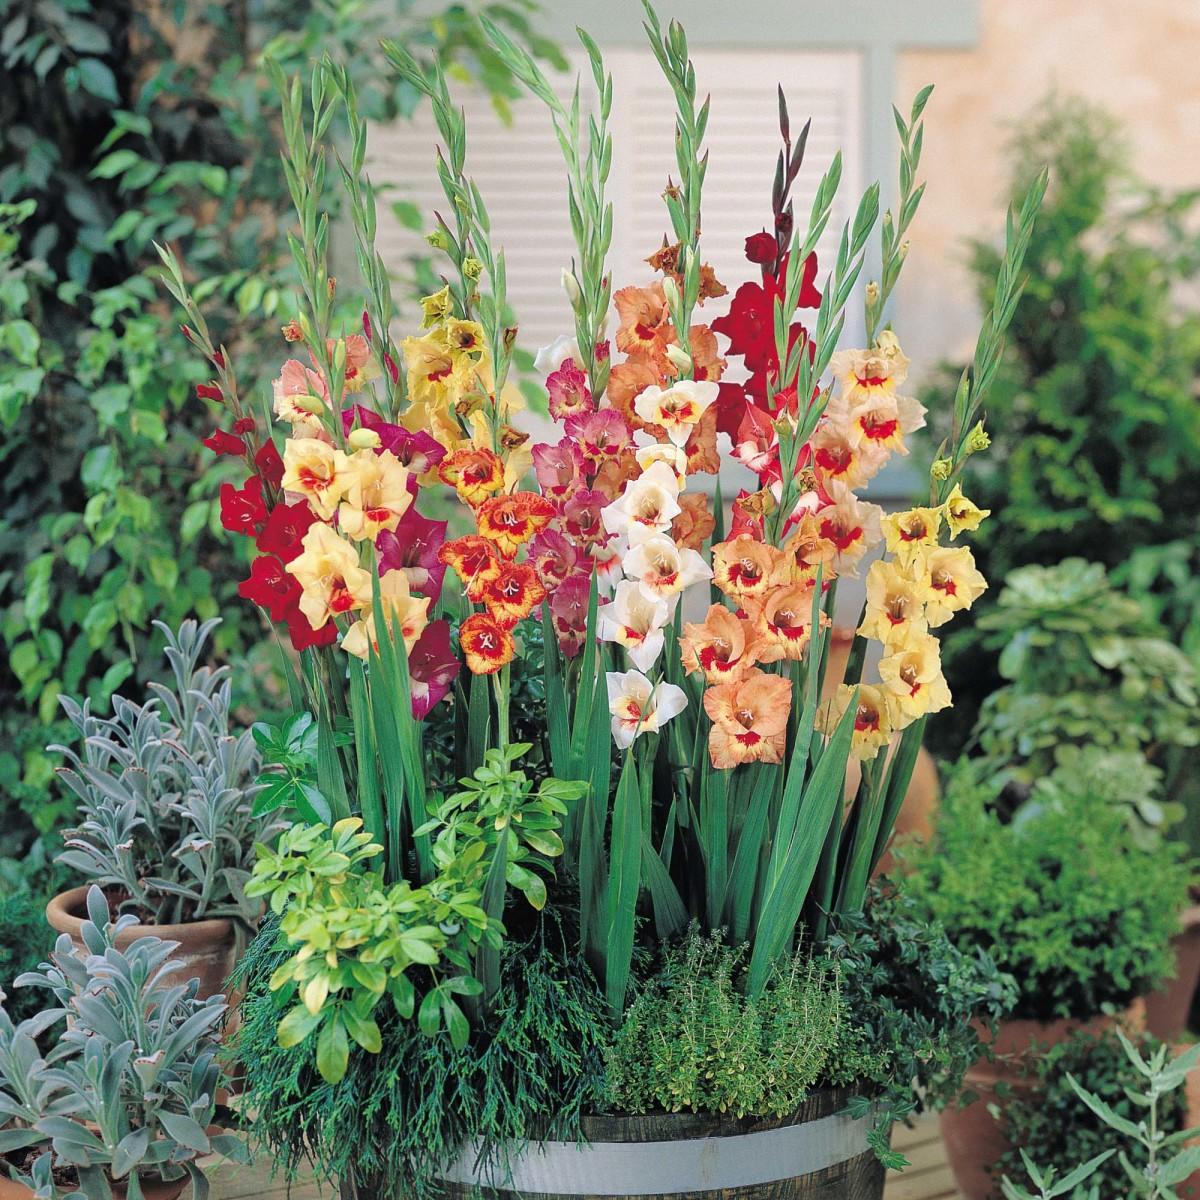 gladiolusgrowplantcaremeaning